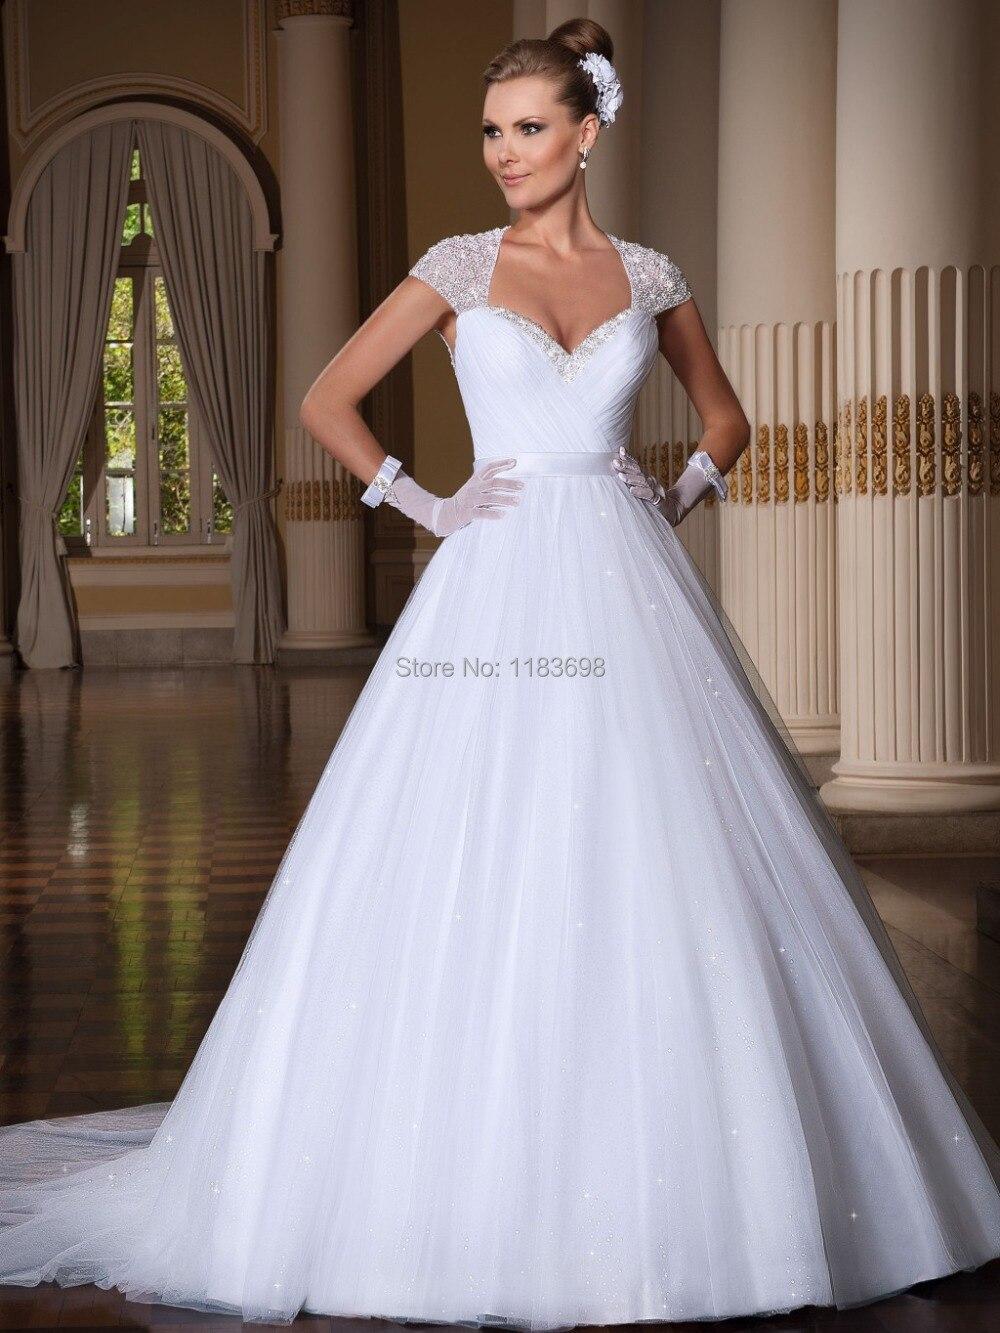 Custom Made vestido de noiva 2019 a-line lace Wedding Dress Open Back sexy Bridal Gown wedding gown vestidos de noivas casamento